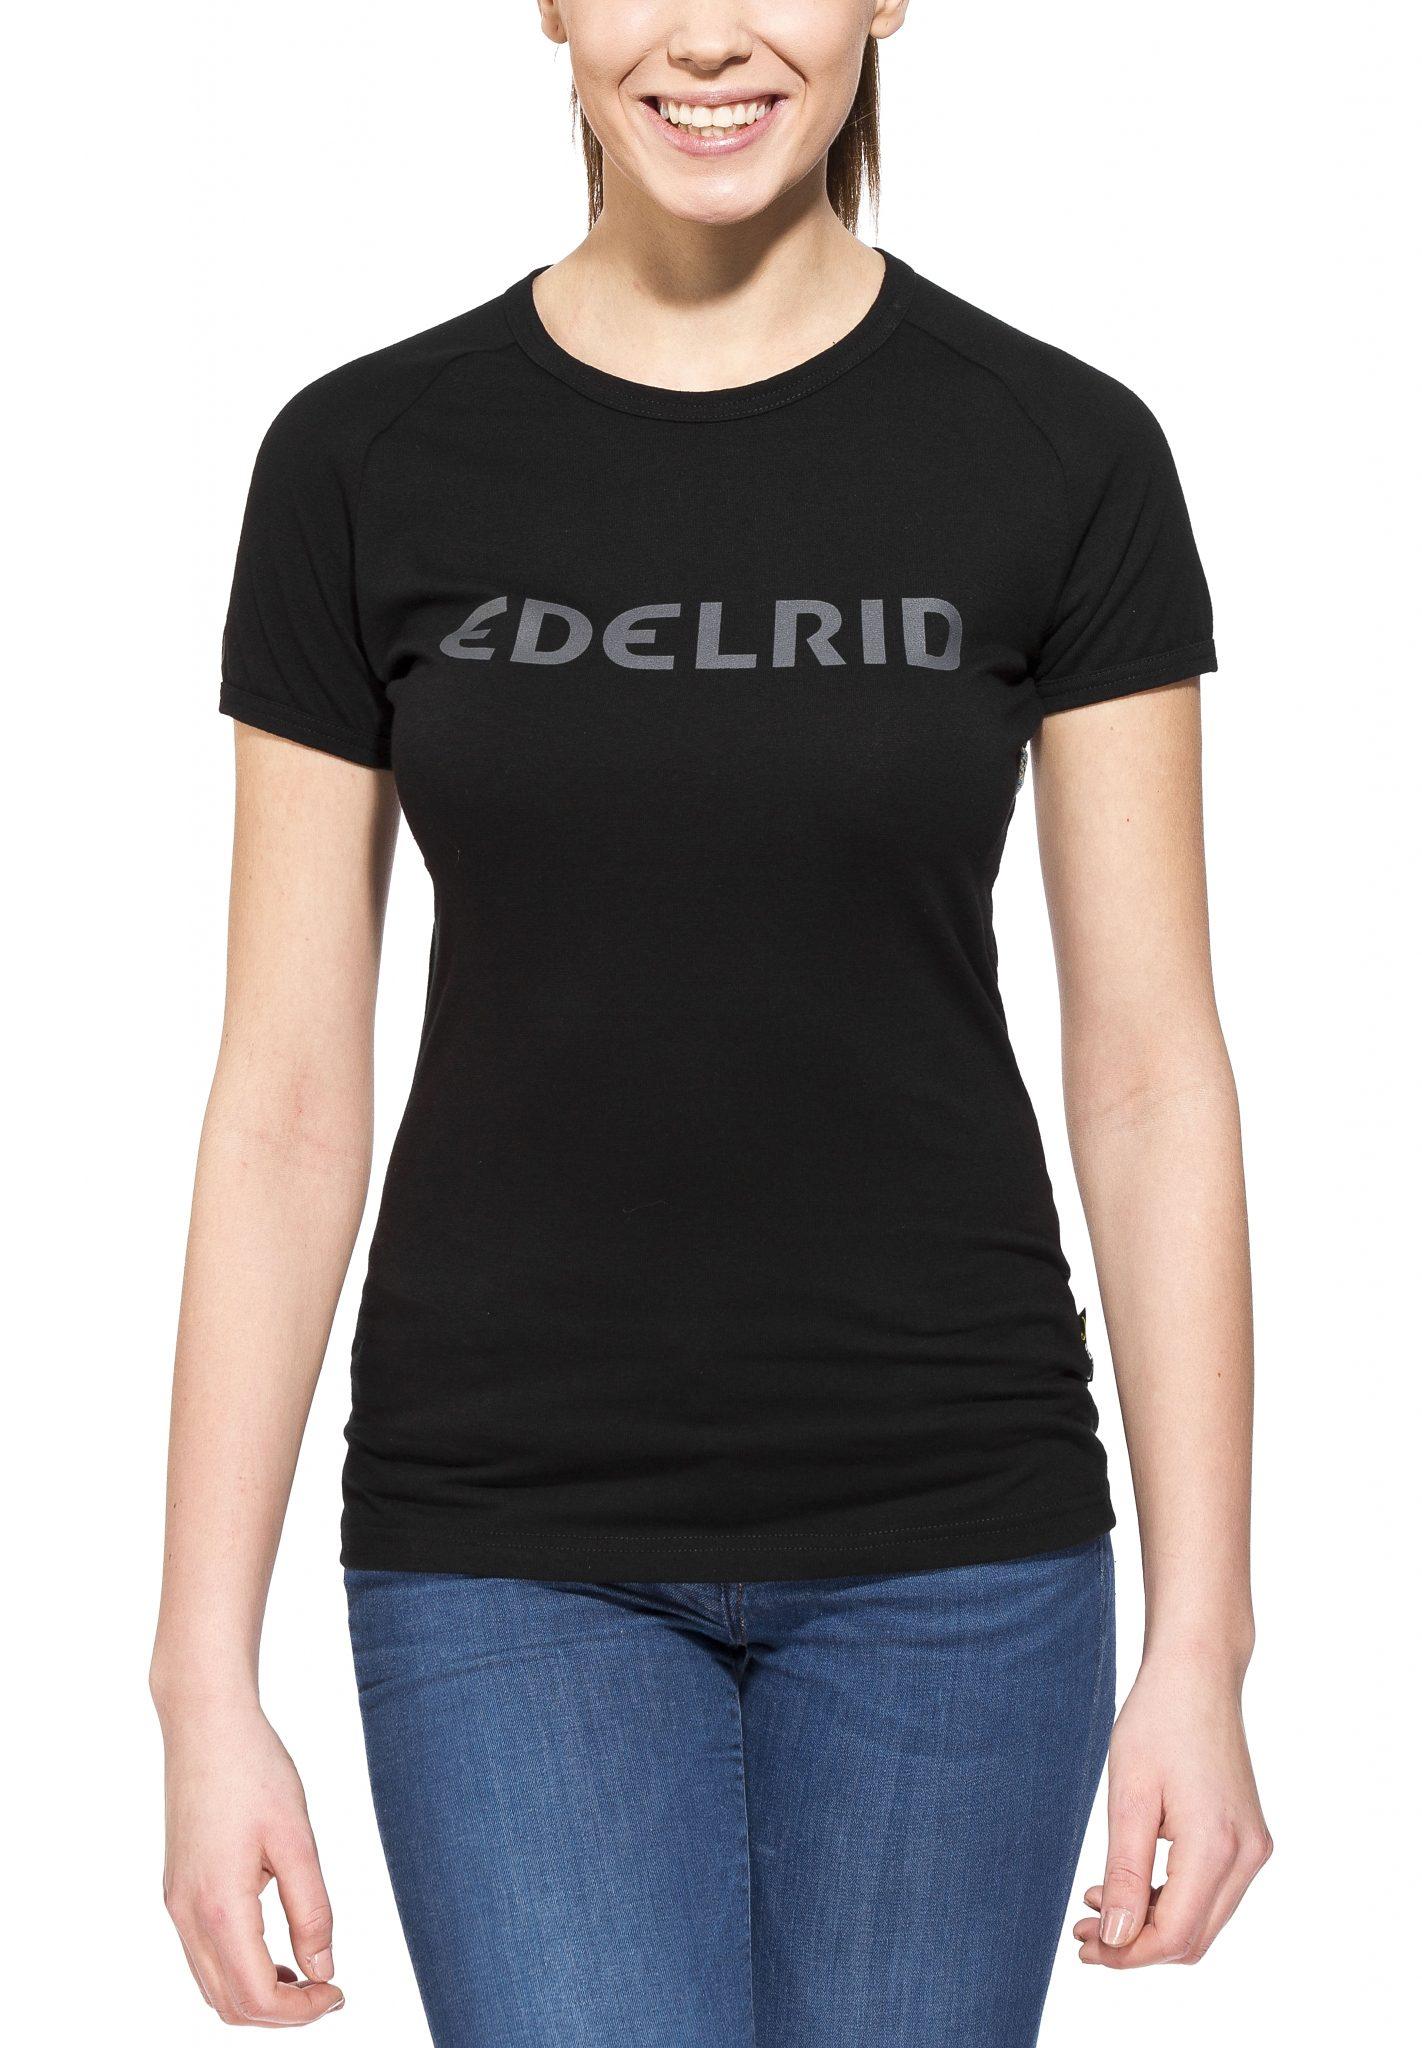 Edelrid T-Shirt »Rope T-Shirt Women«